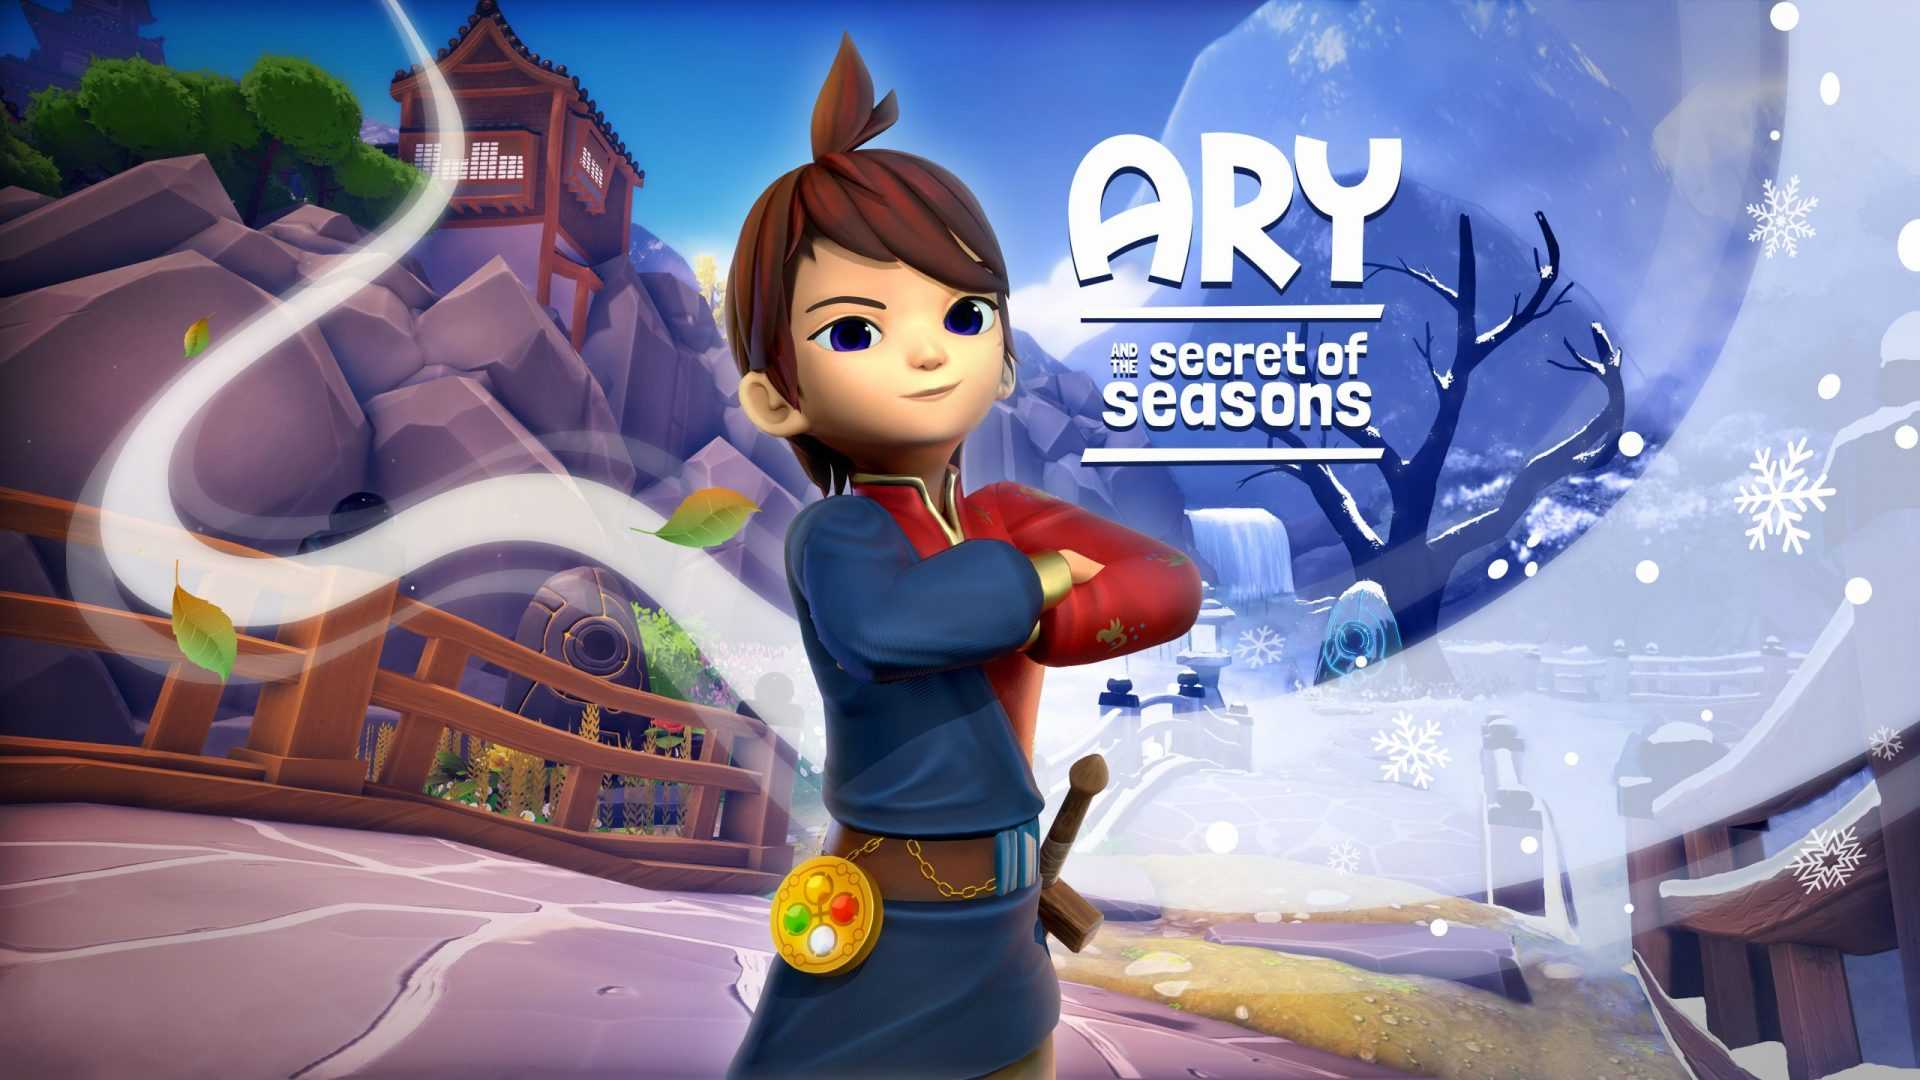 Ary-and-the-secret-seasons-NintendOn (5)